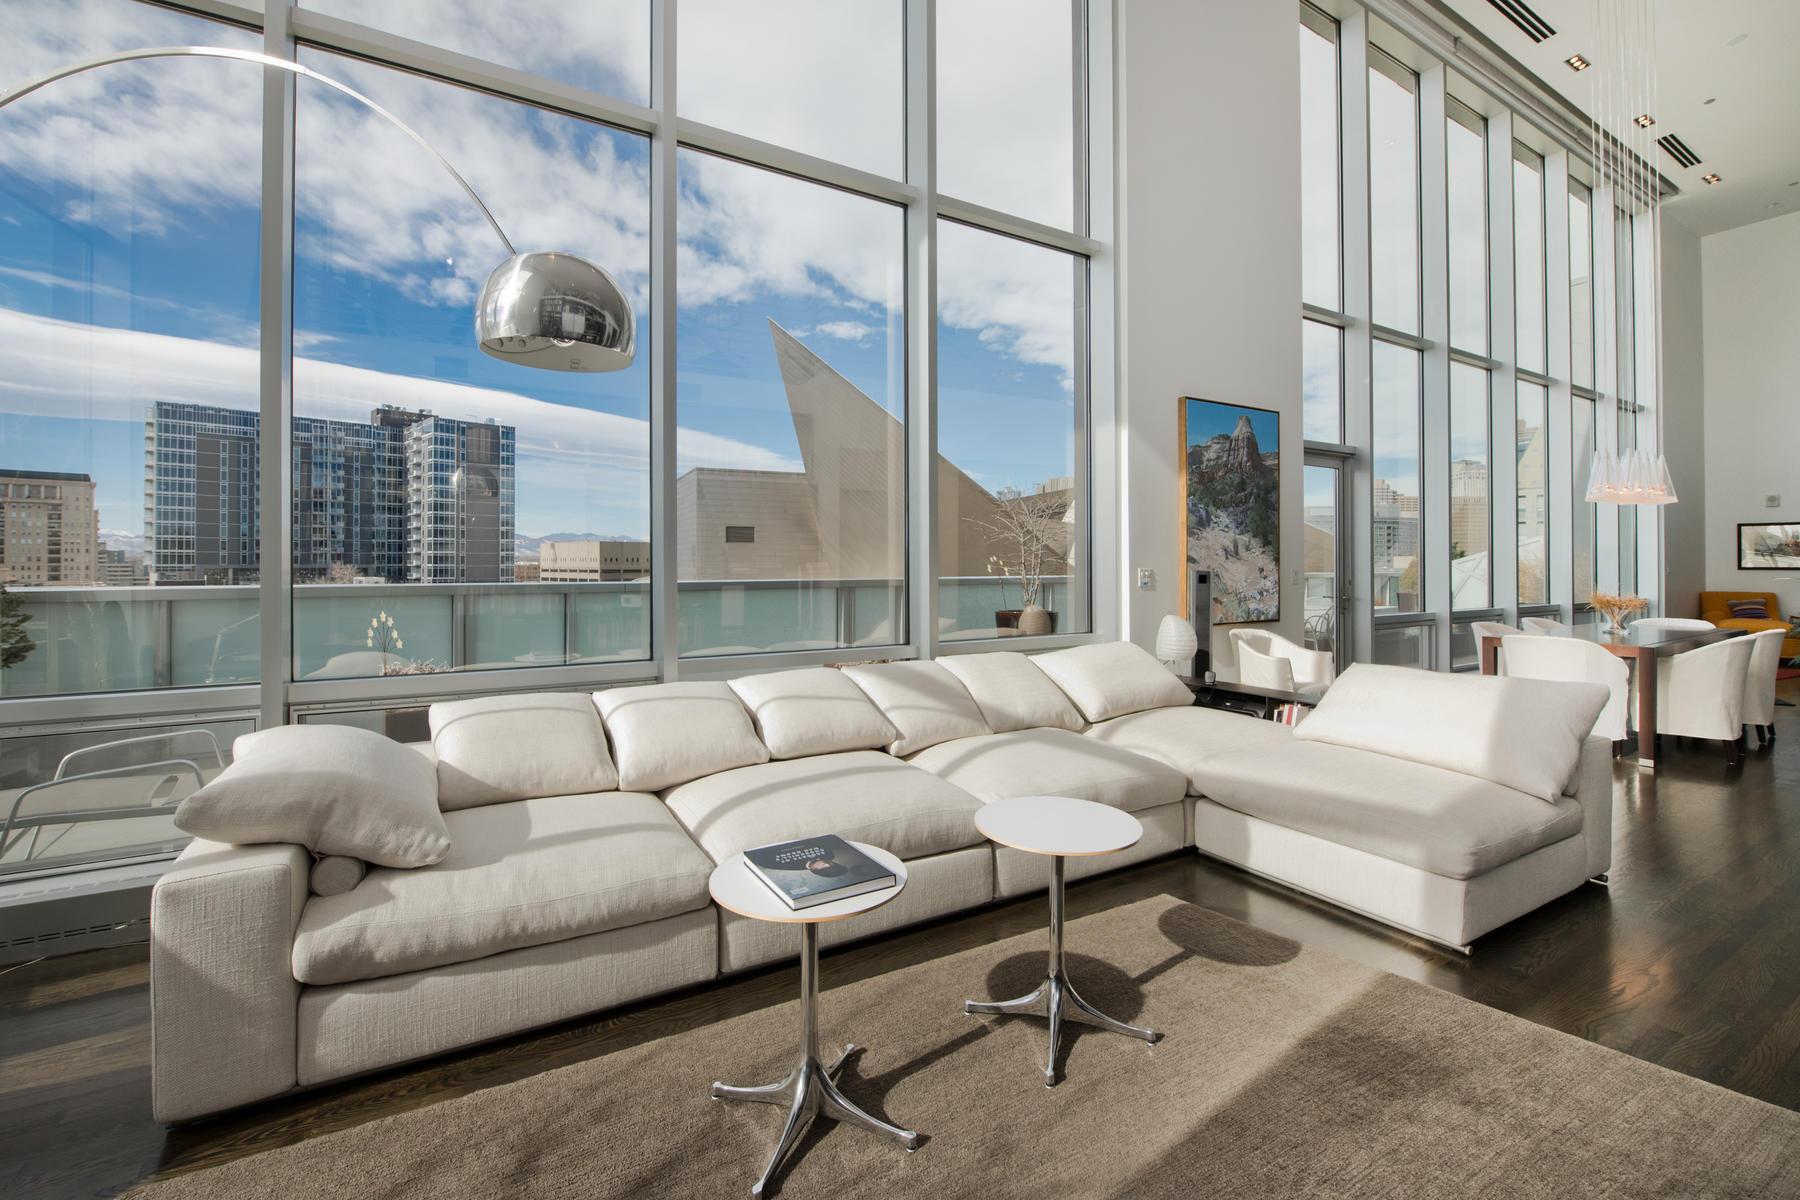 Property for Active at Denver Art Museum Residences 1200 Acoma Street 604 Denver, Colorado 80204 United States